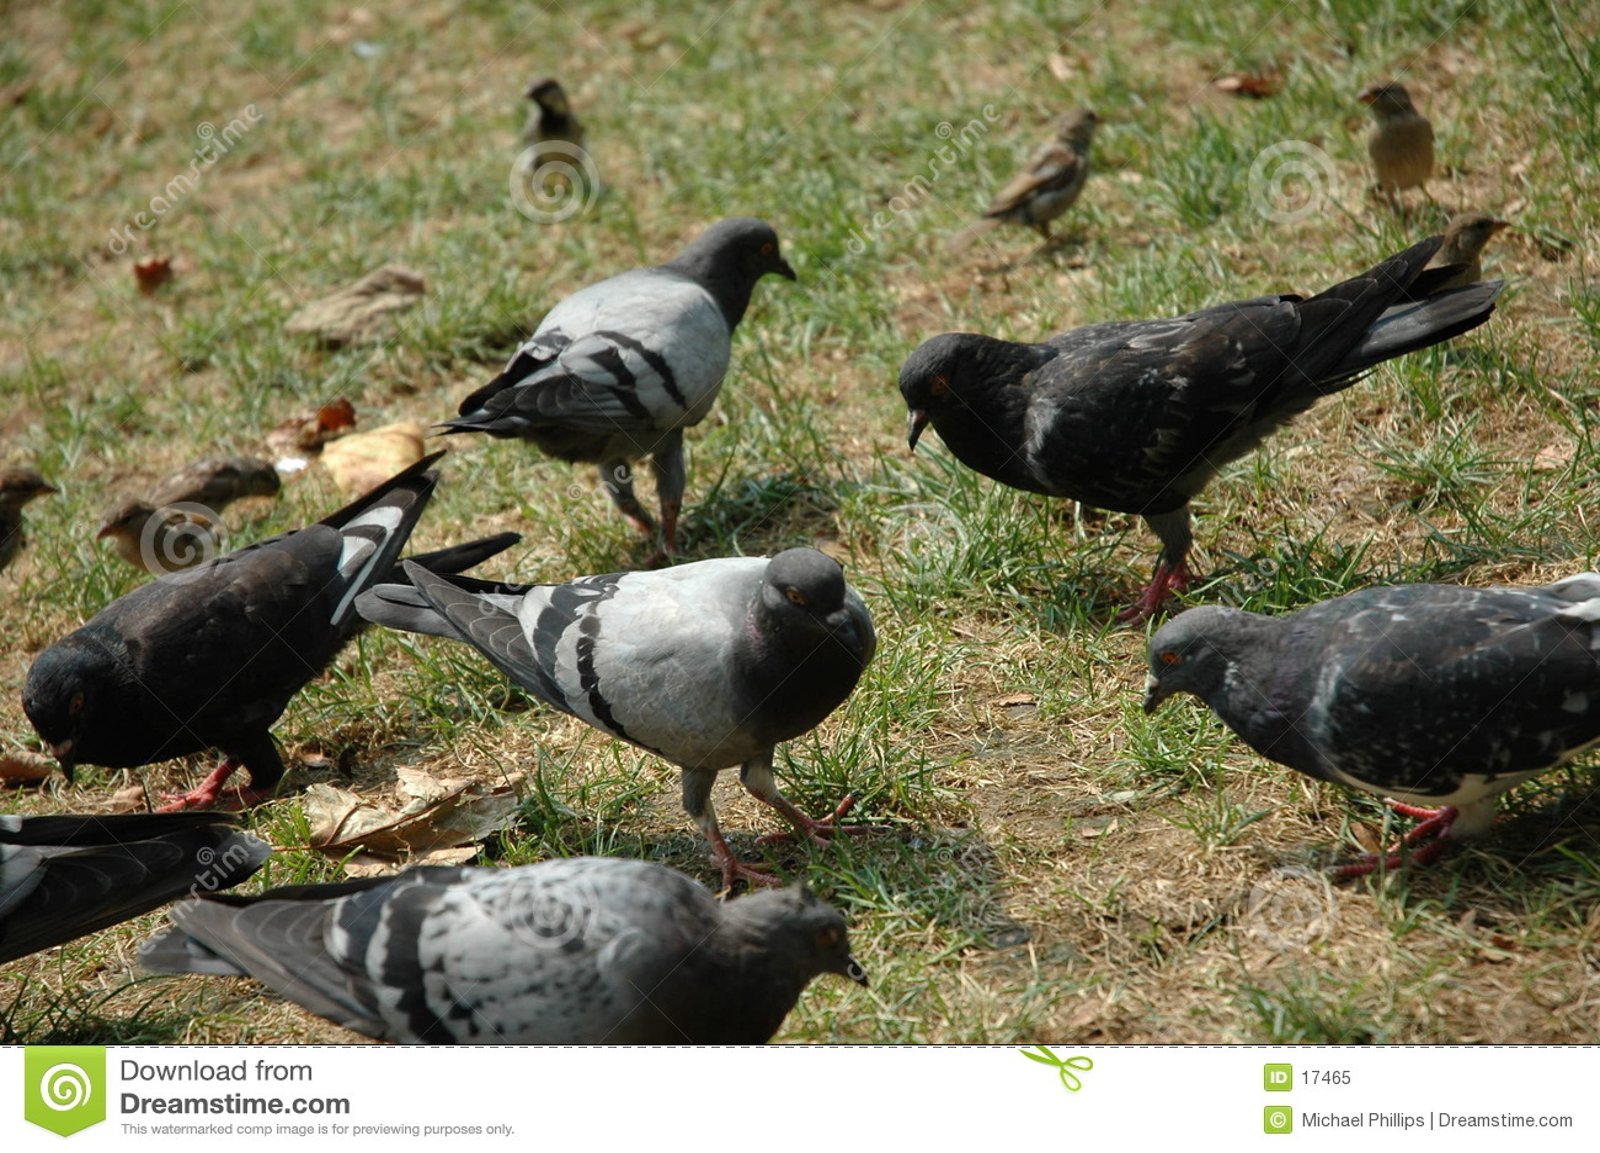 Pigeonsinthepark